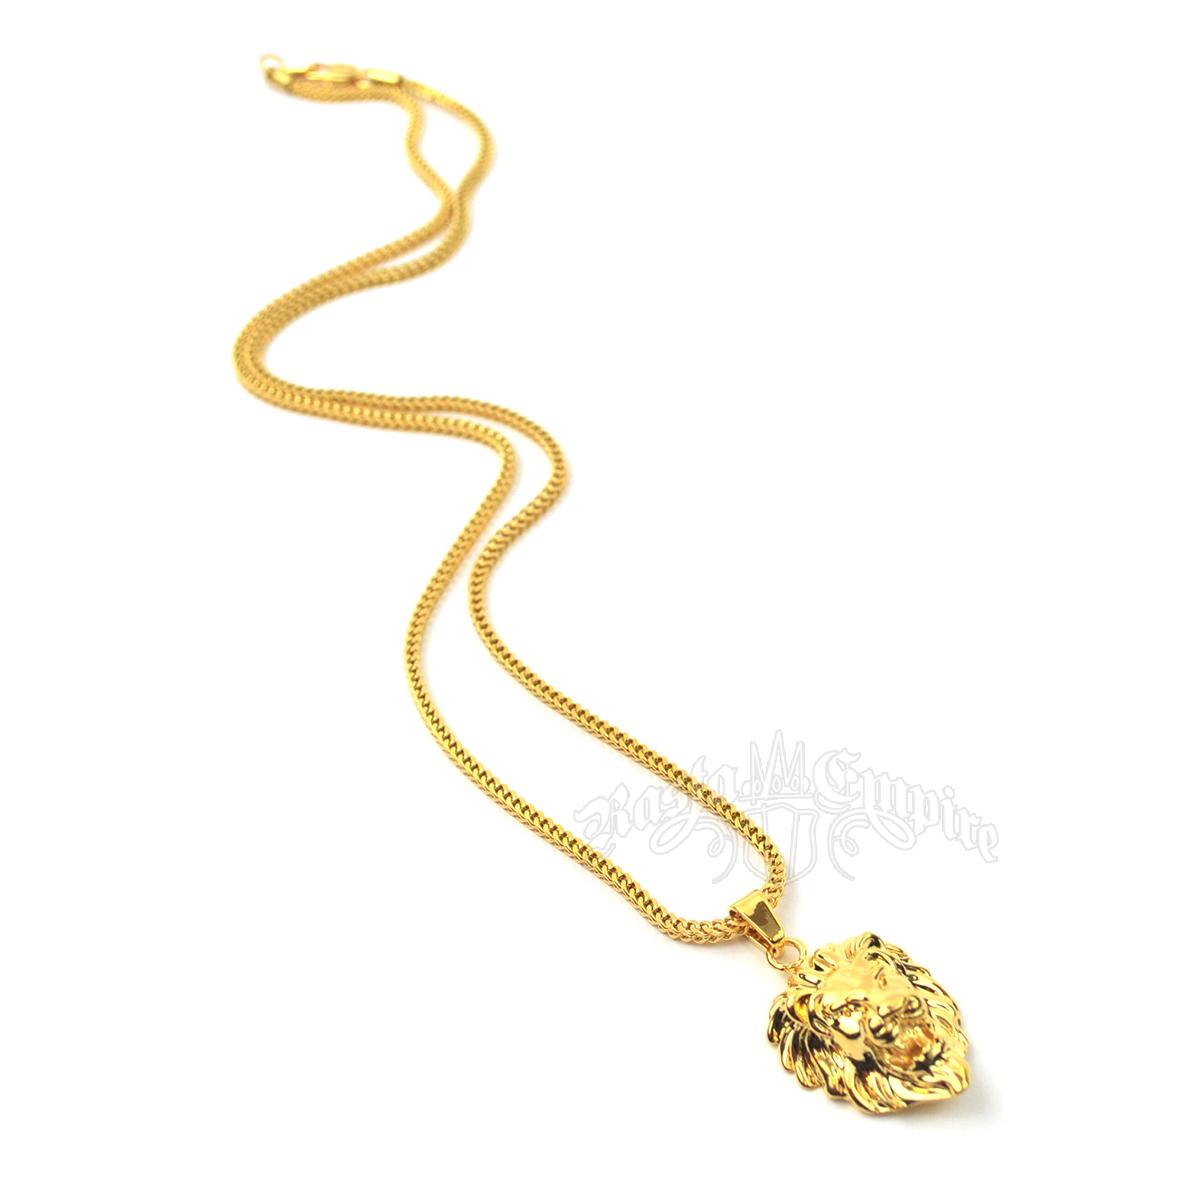 Gold lion head necklace show picture 1 show picture 2 aloadofball Choice Image